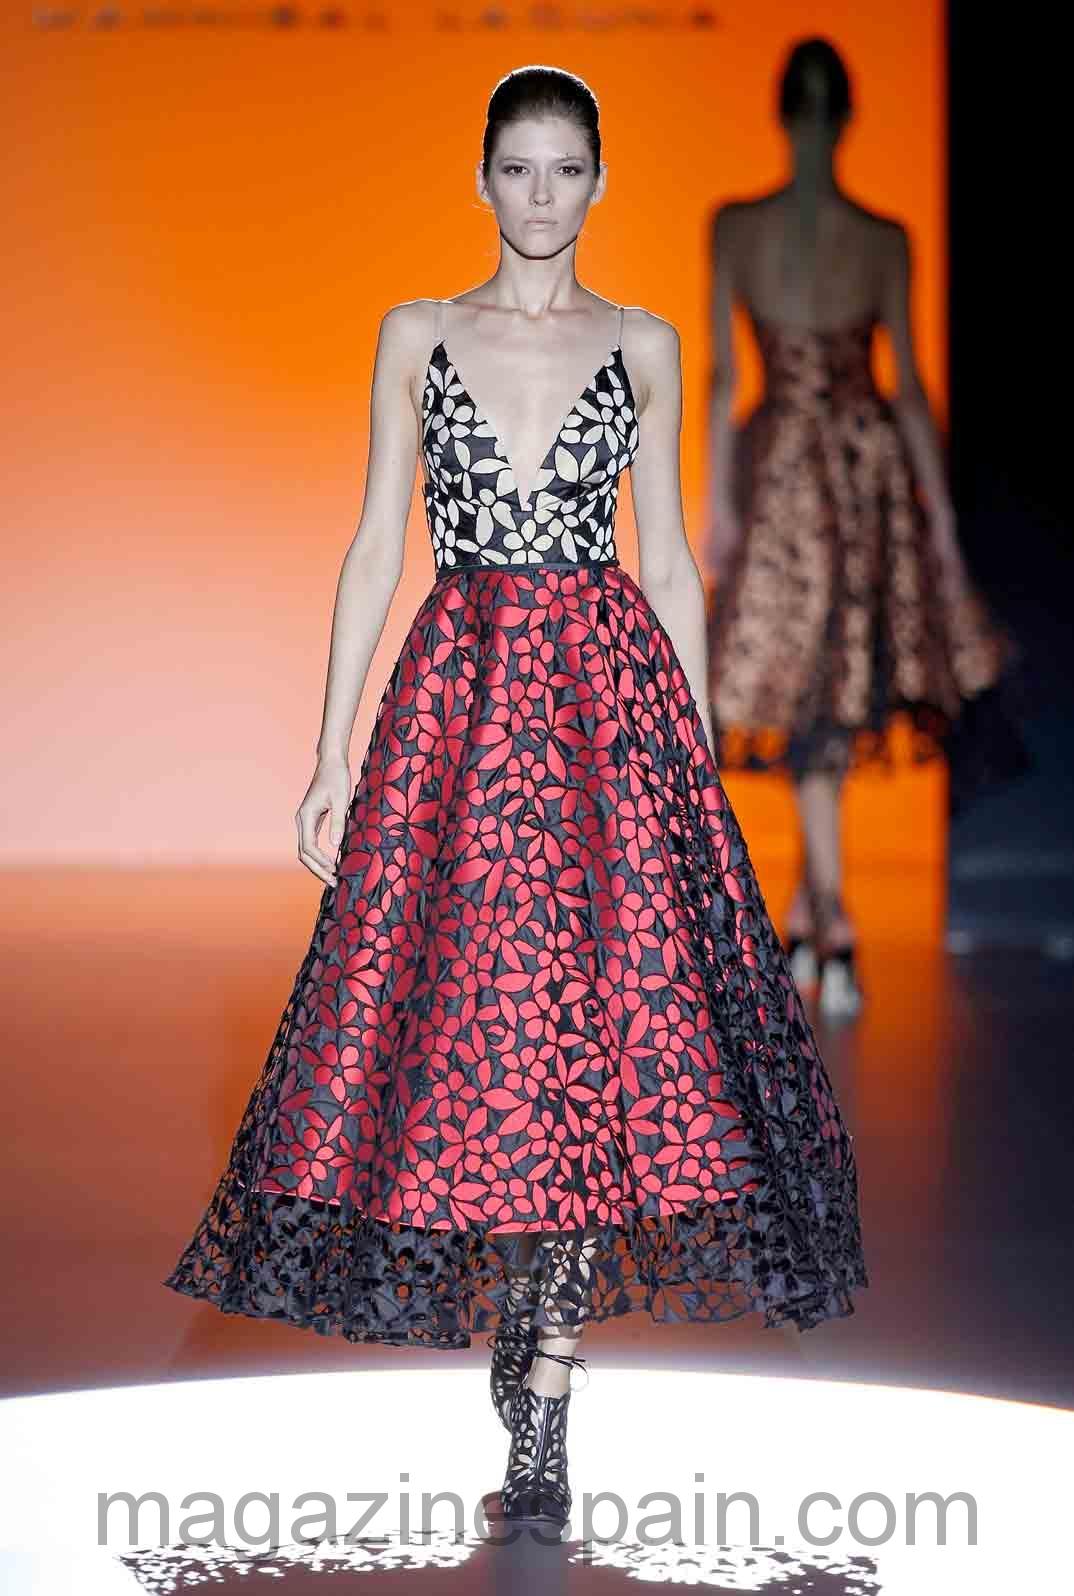 Mercedes Benz Fashion Week Madrid: Hannibal Laguna